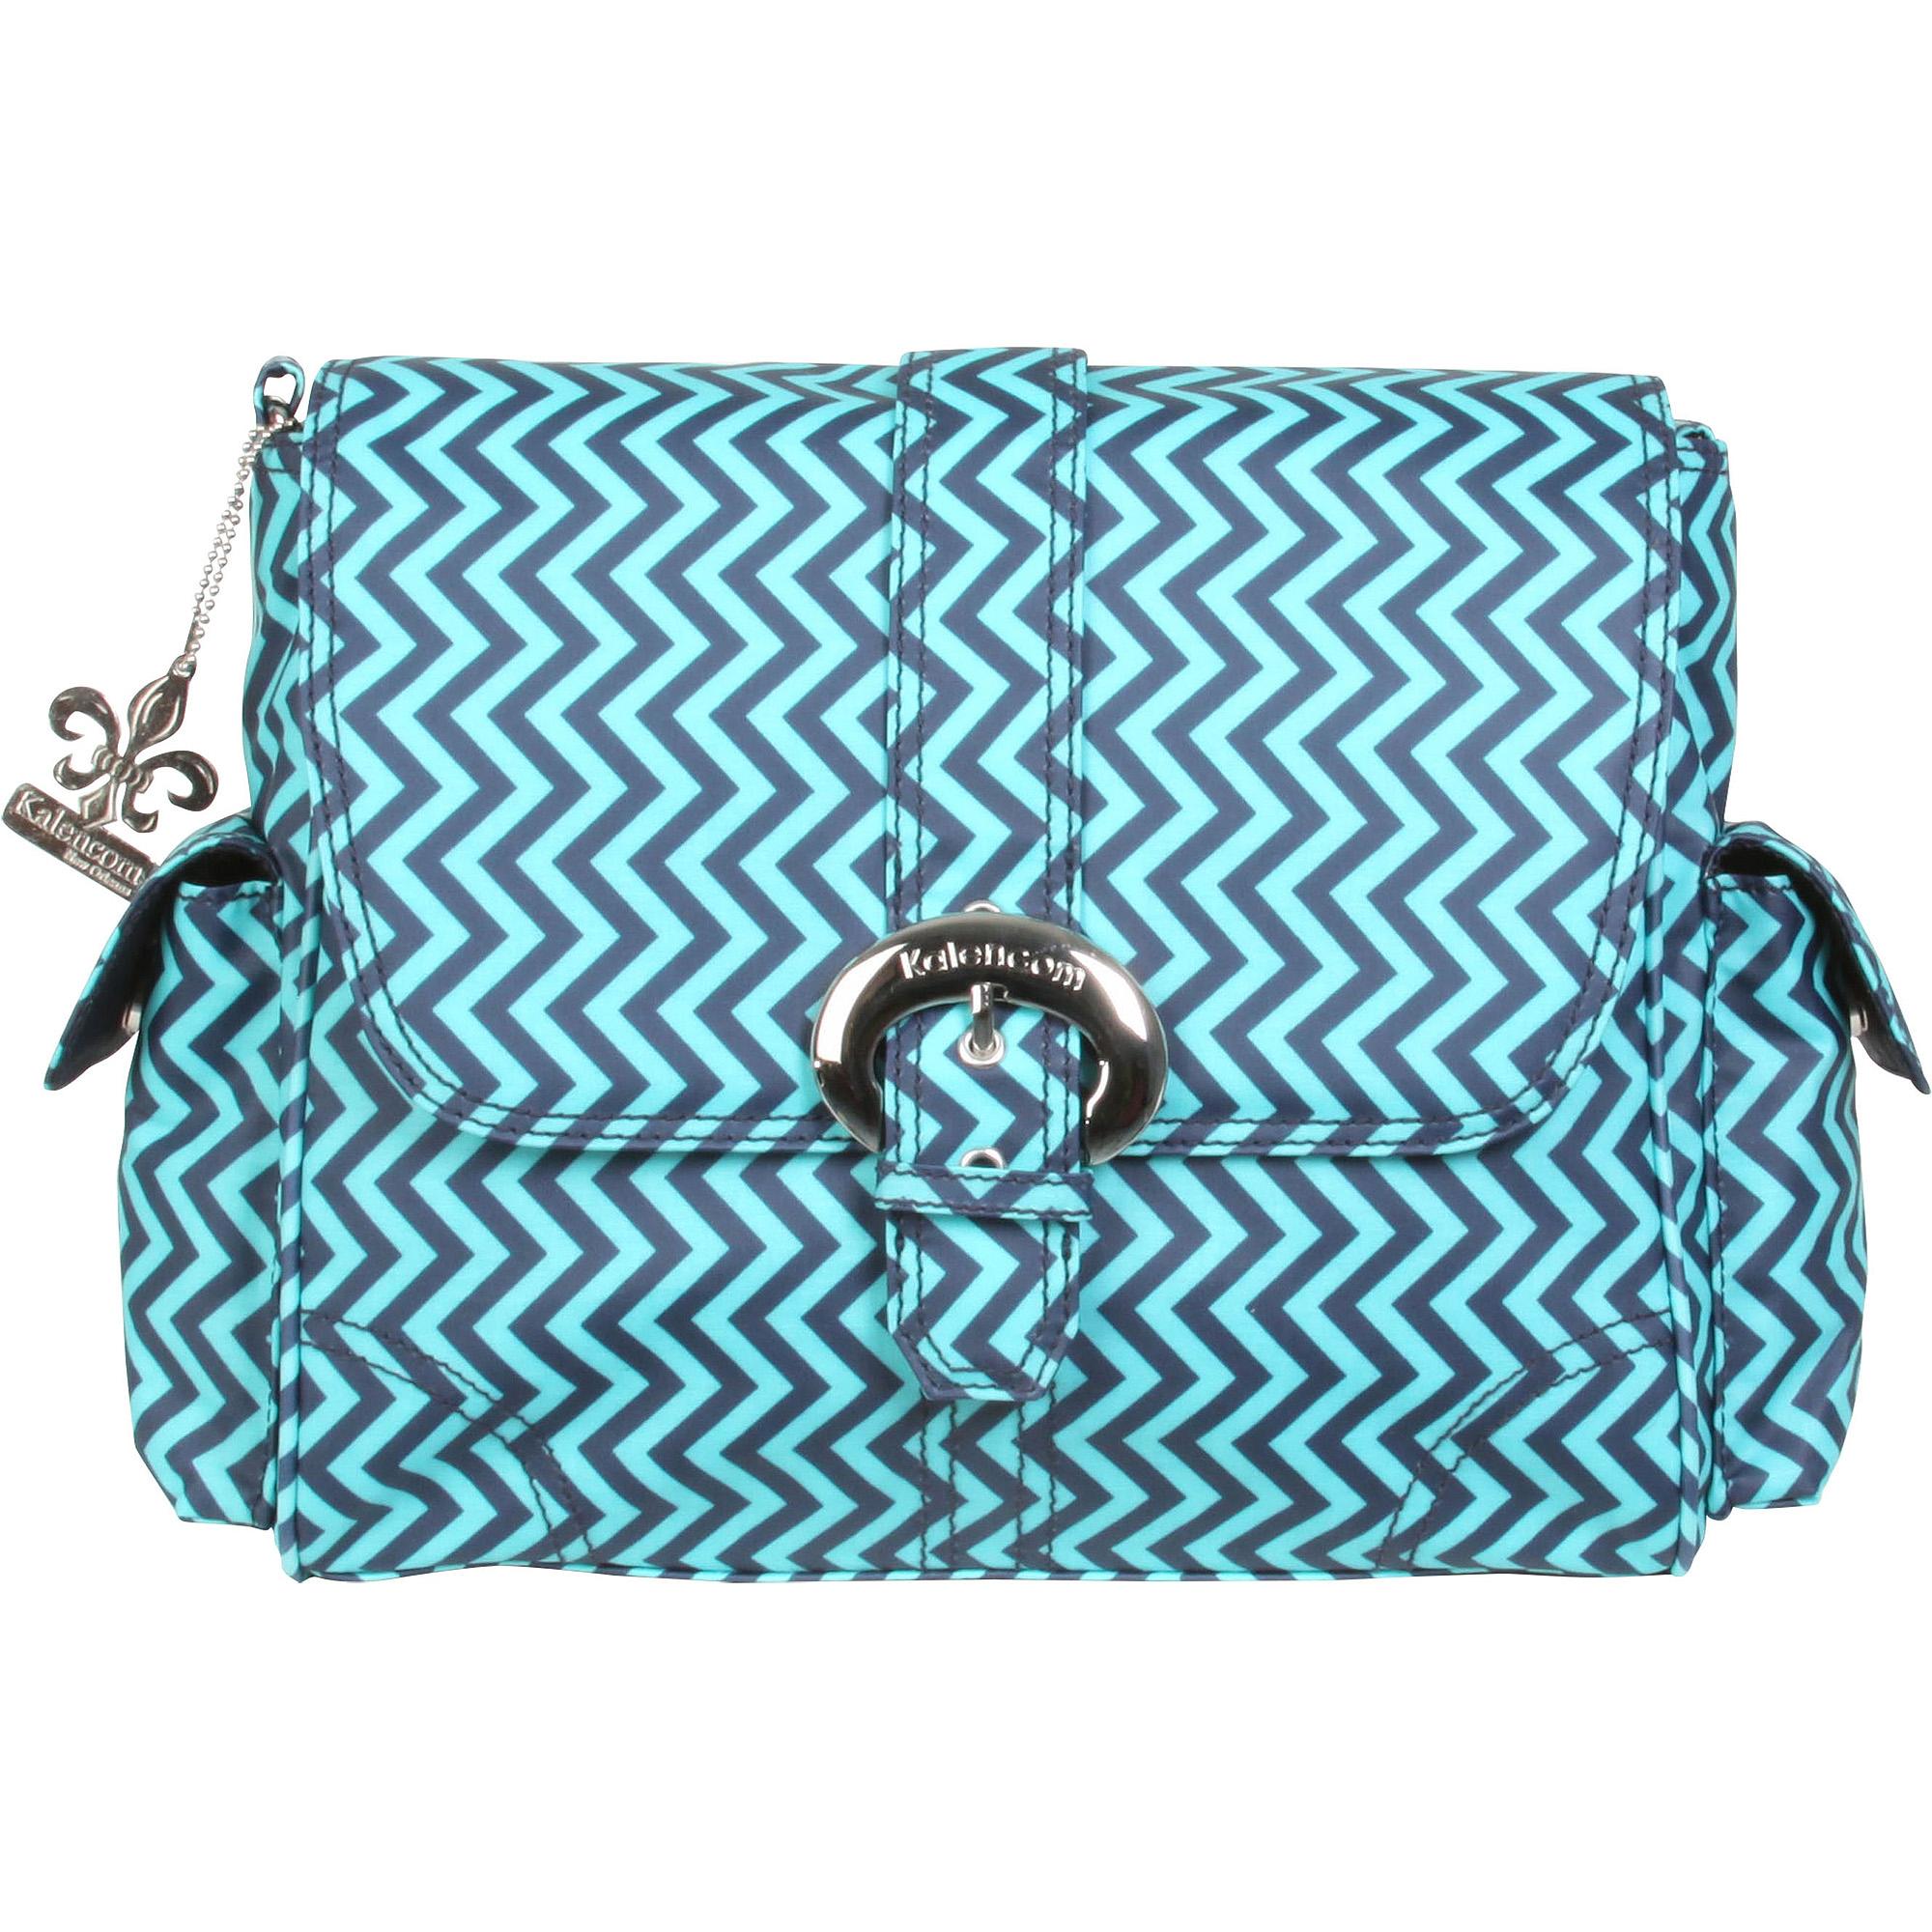 Kalencom Messenger Buckle Diaper Bag, Wiggly Stripes Ocean, Matte Coated by Kalencom